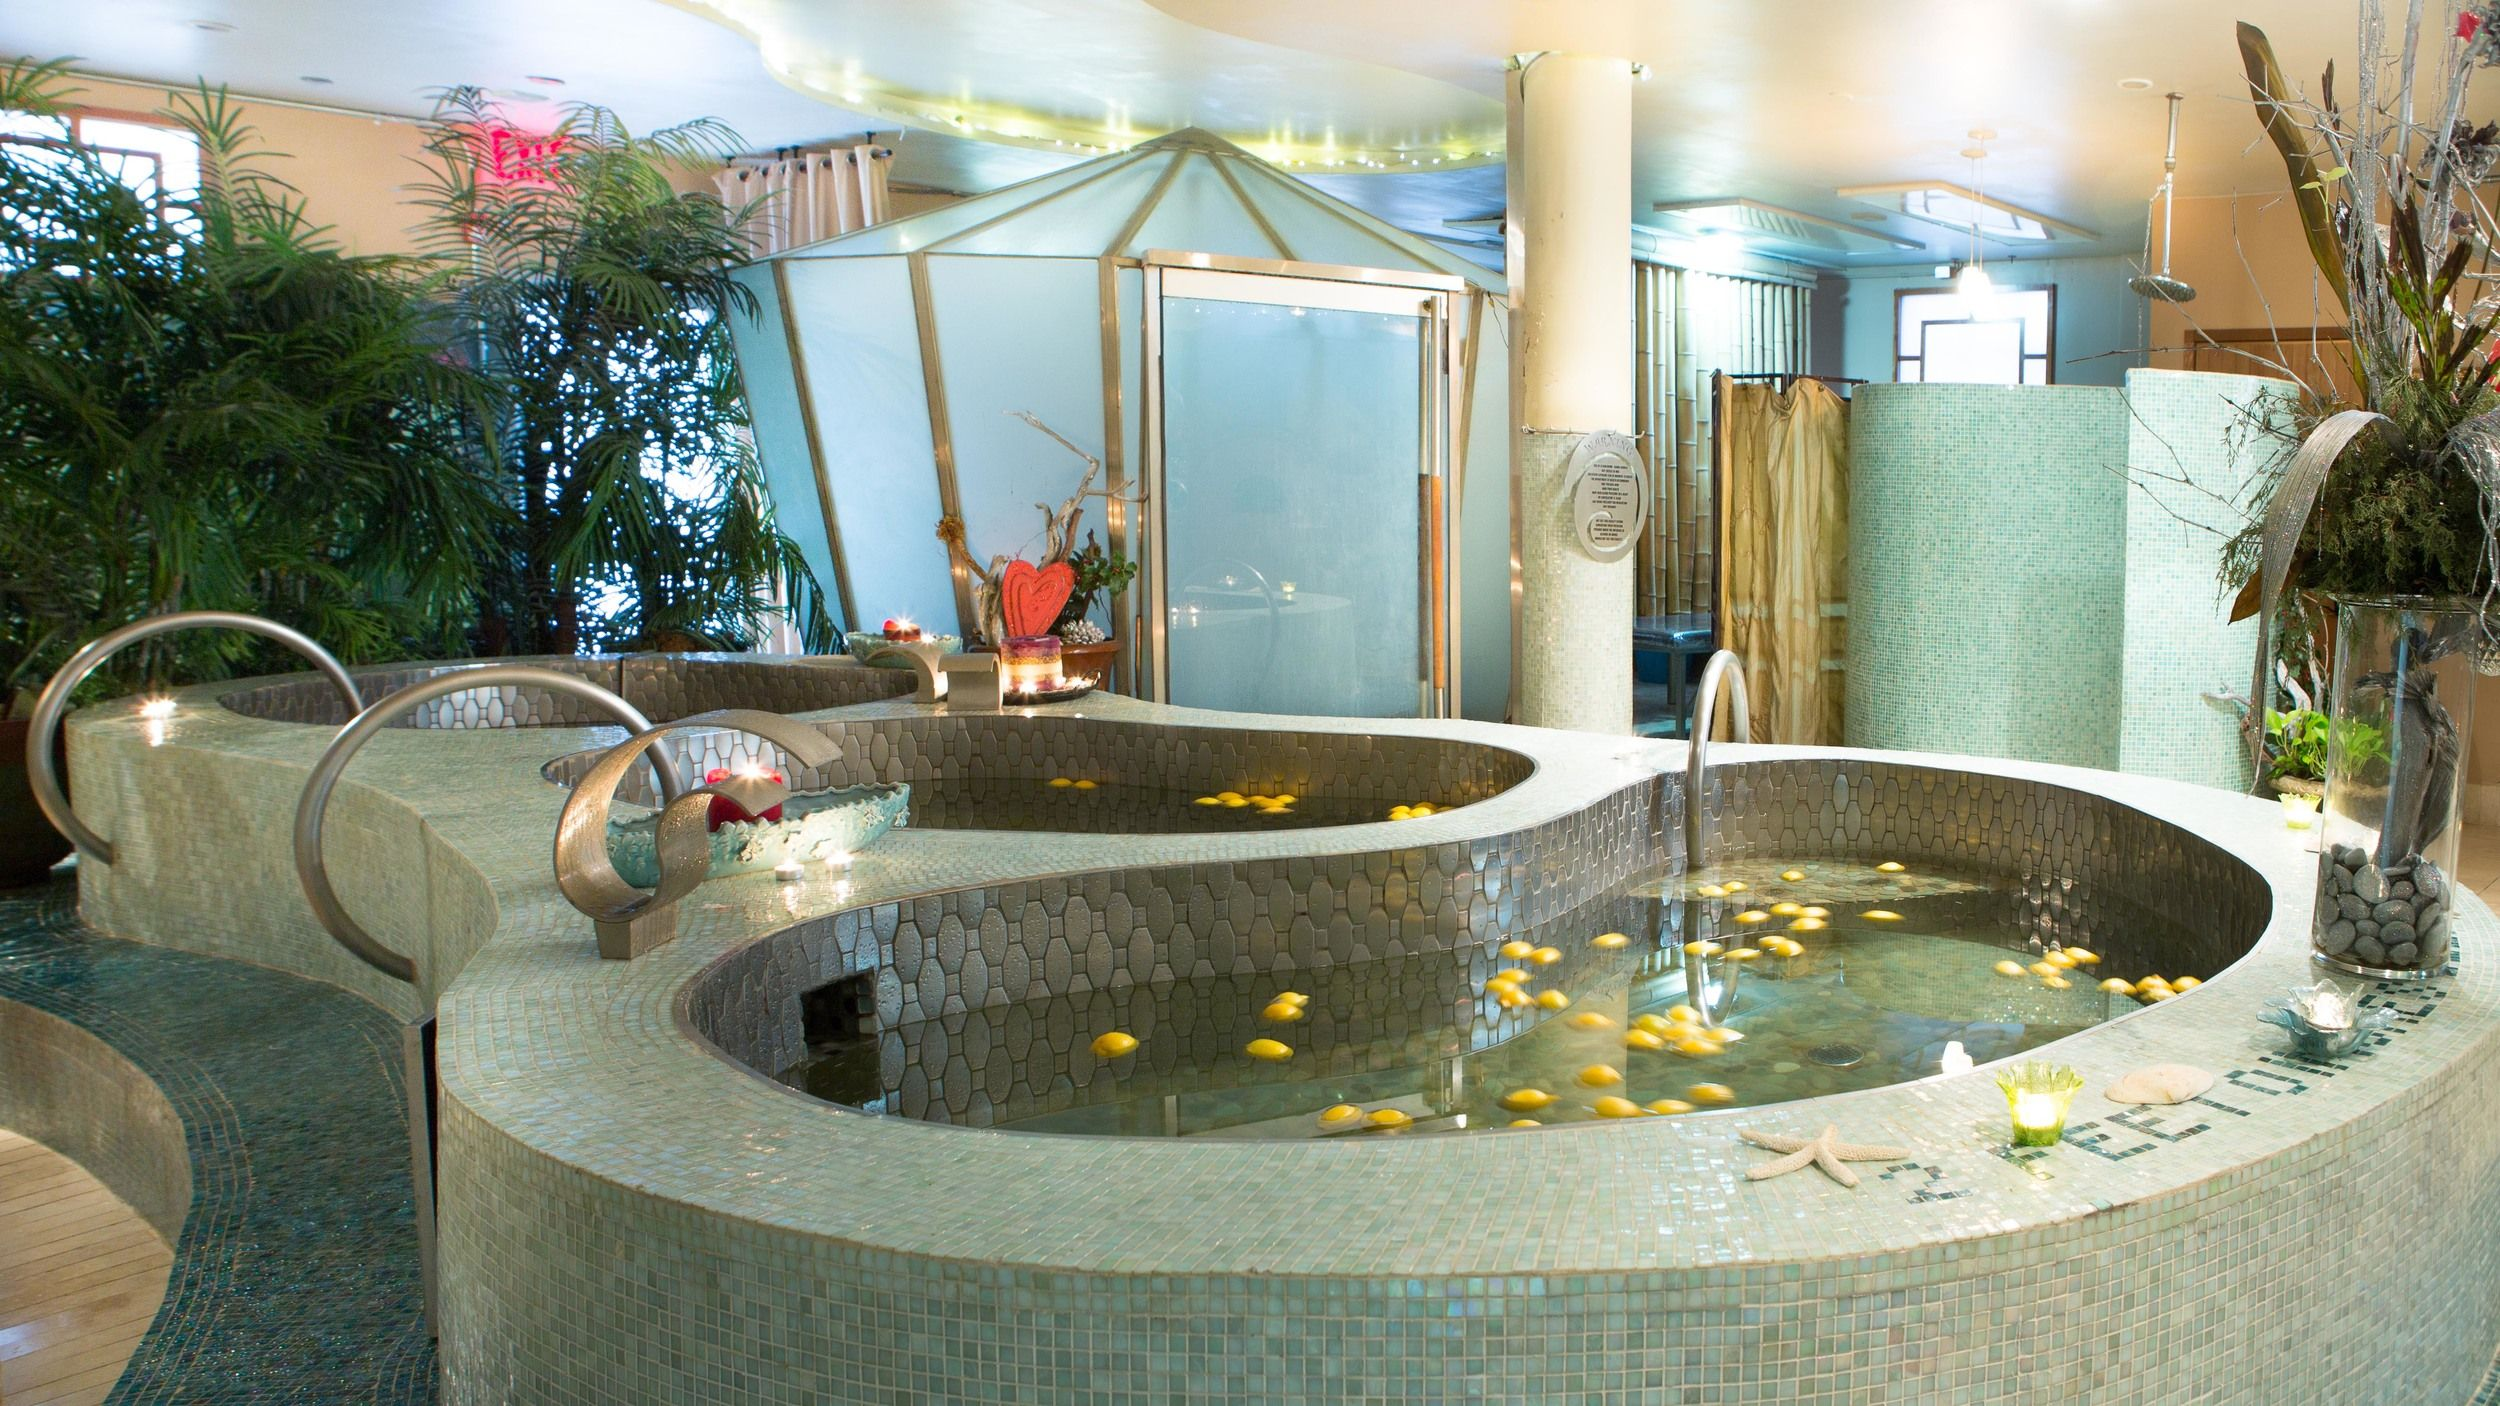 Spa Deal, Foot massage in New York NYC, deep tissue massage